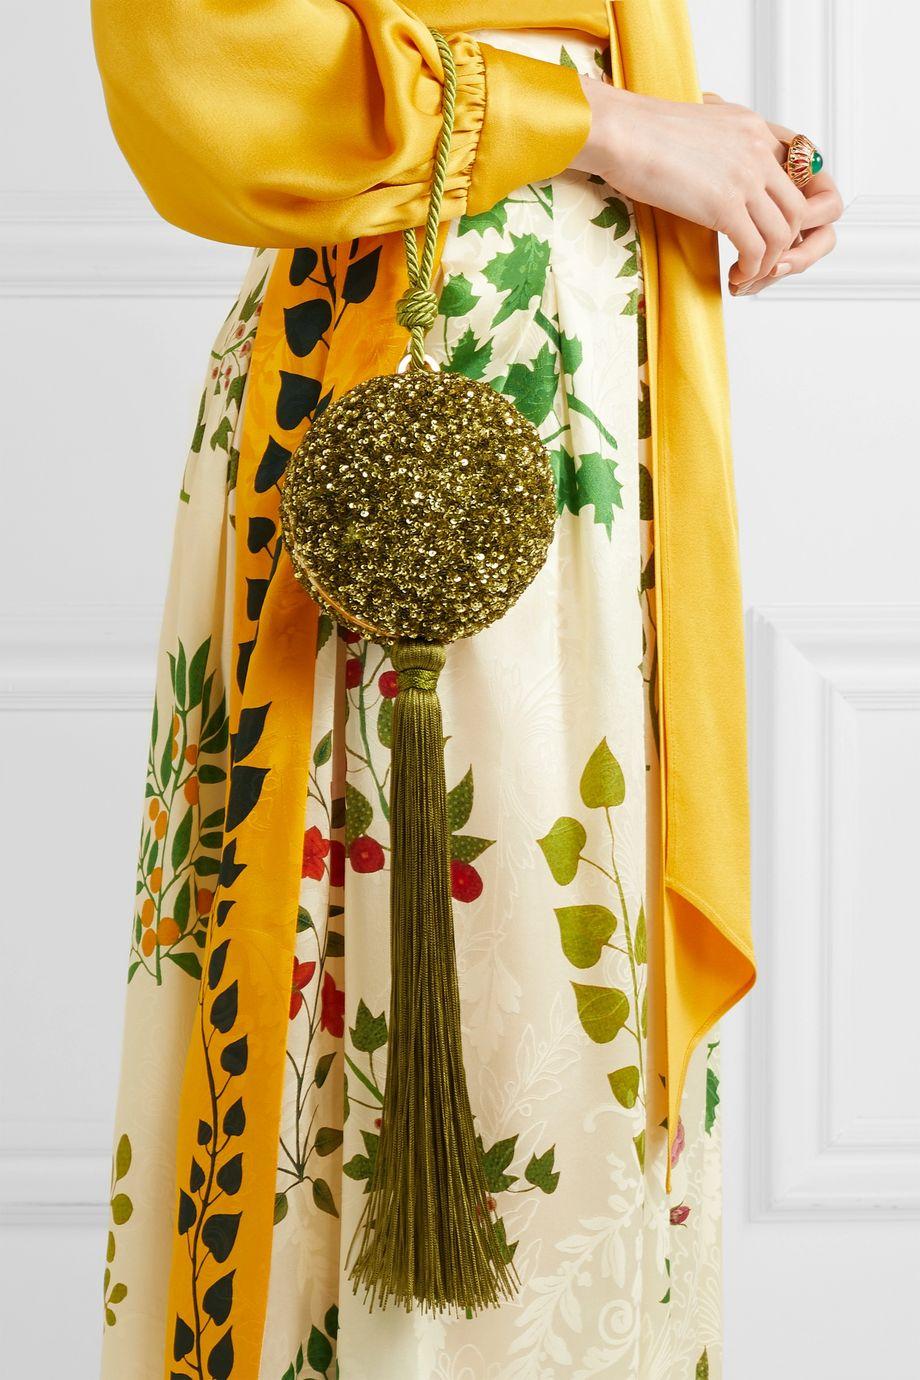 Oscar de la Renta Billiard tasseled sequined clutch